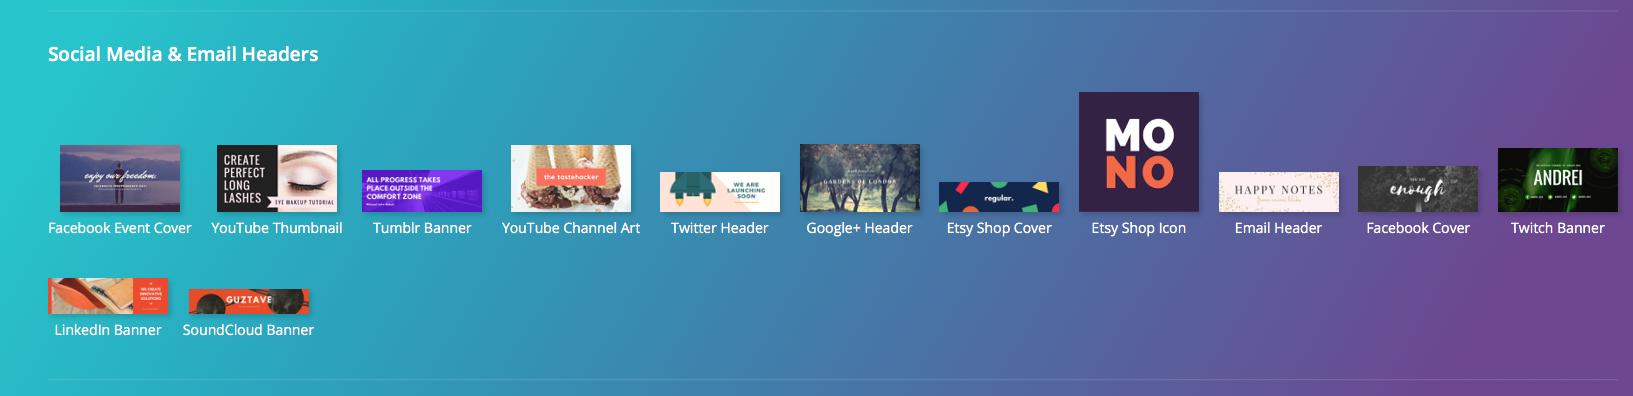 YouTube Thumbnails: Should I use Adobe Spark or Canva com